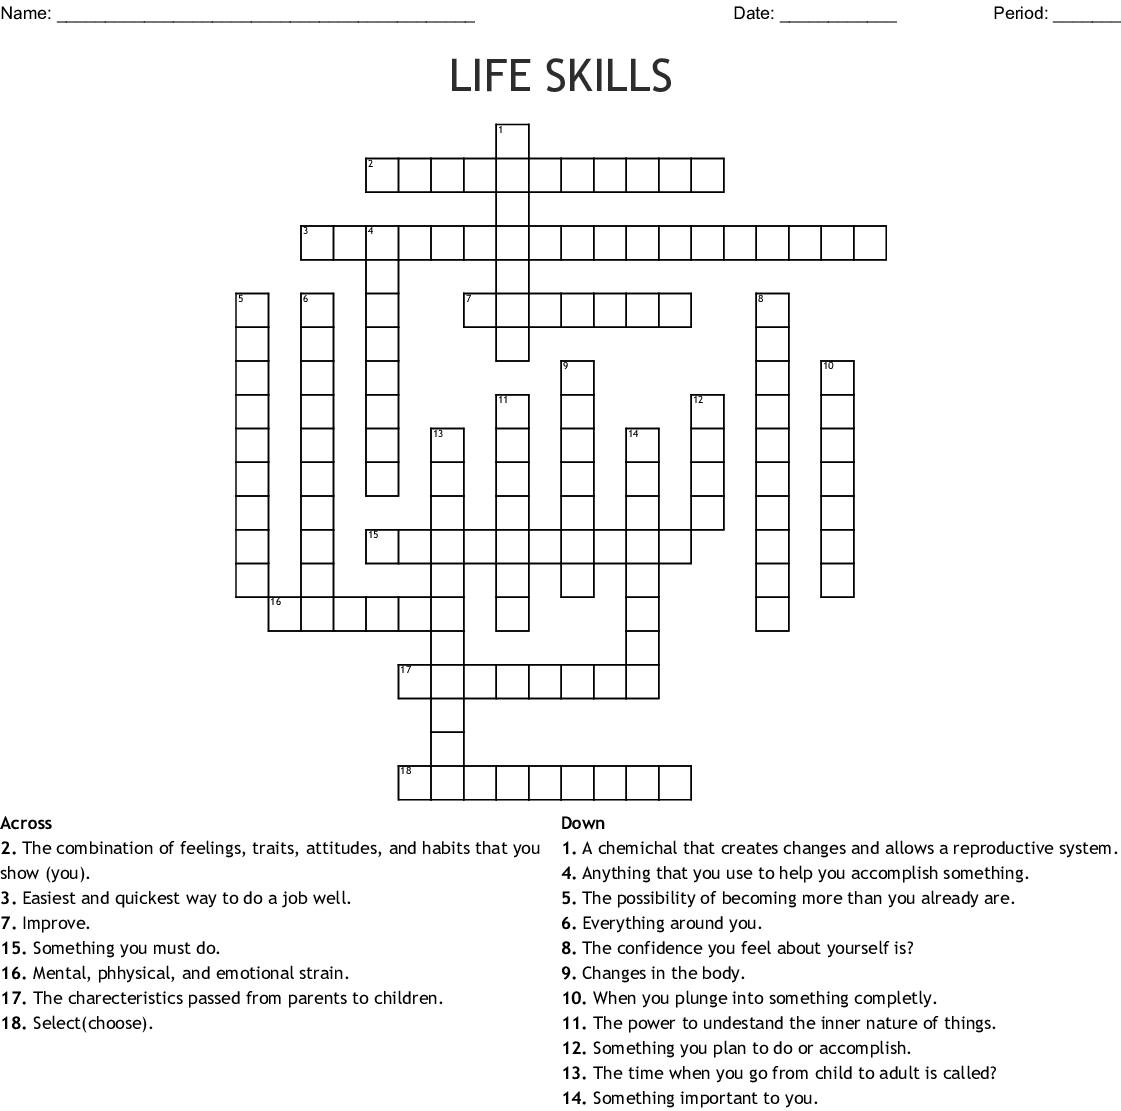 Life Skills Crossword Wordmint